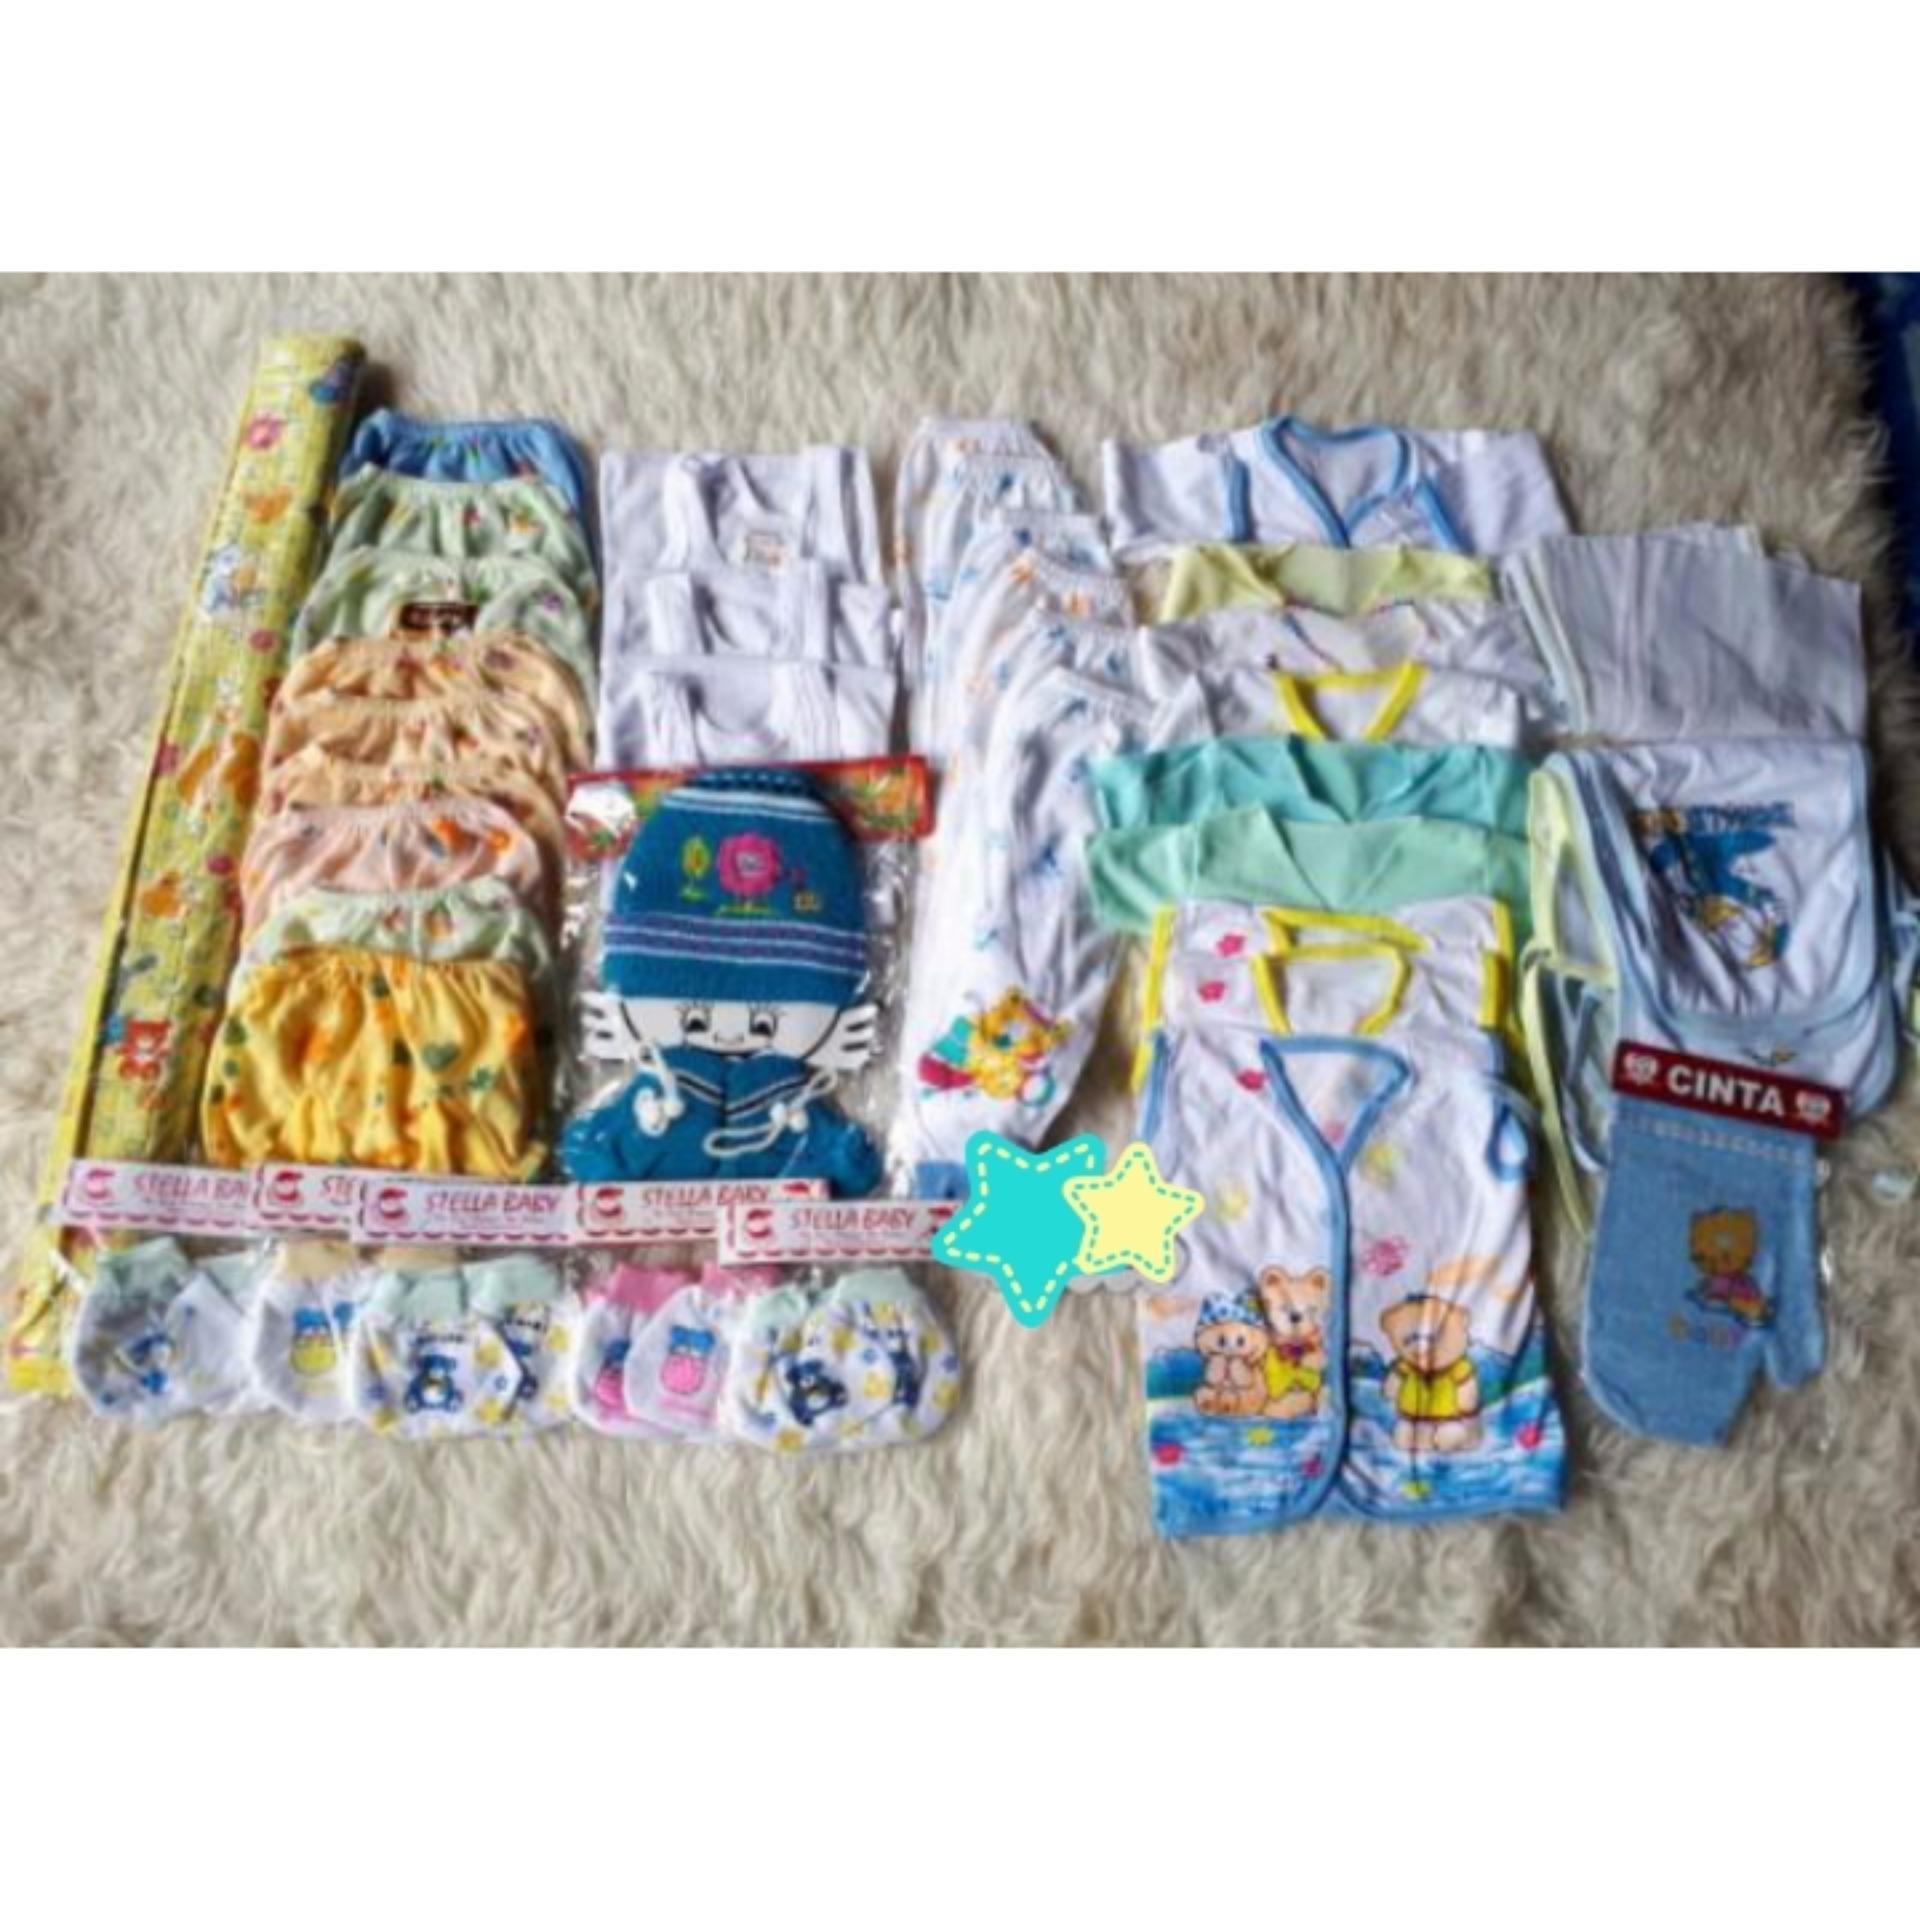 Paket perlengkapan bayi (baby boy)/Newborn(bayi baru lahir) murah &